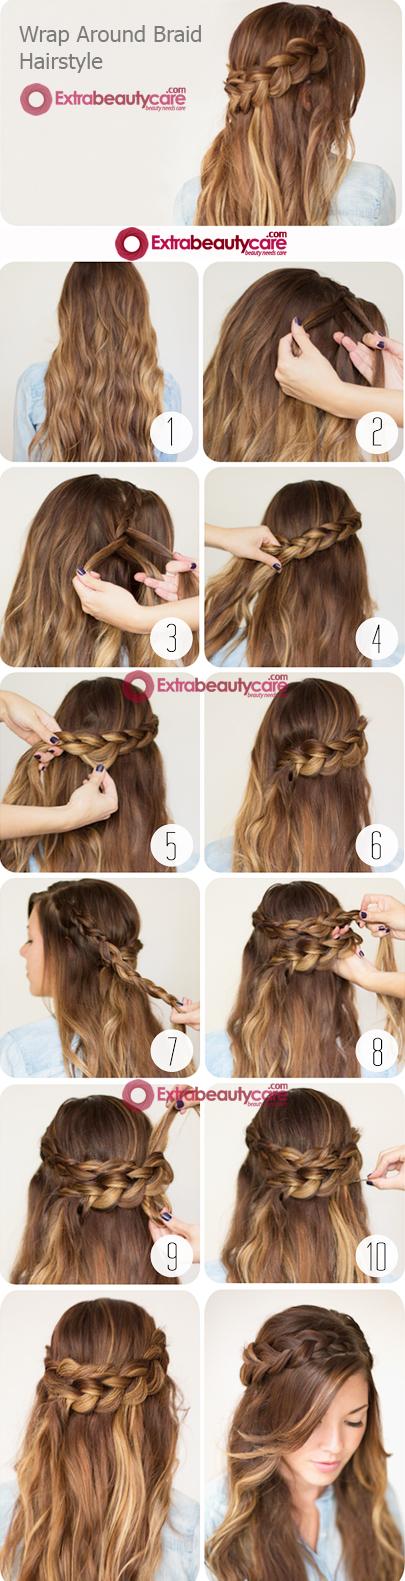 Wrap-around-braid-hairstyle